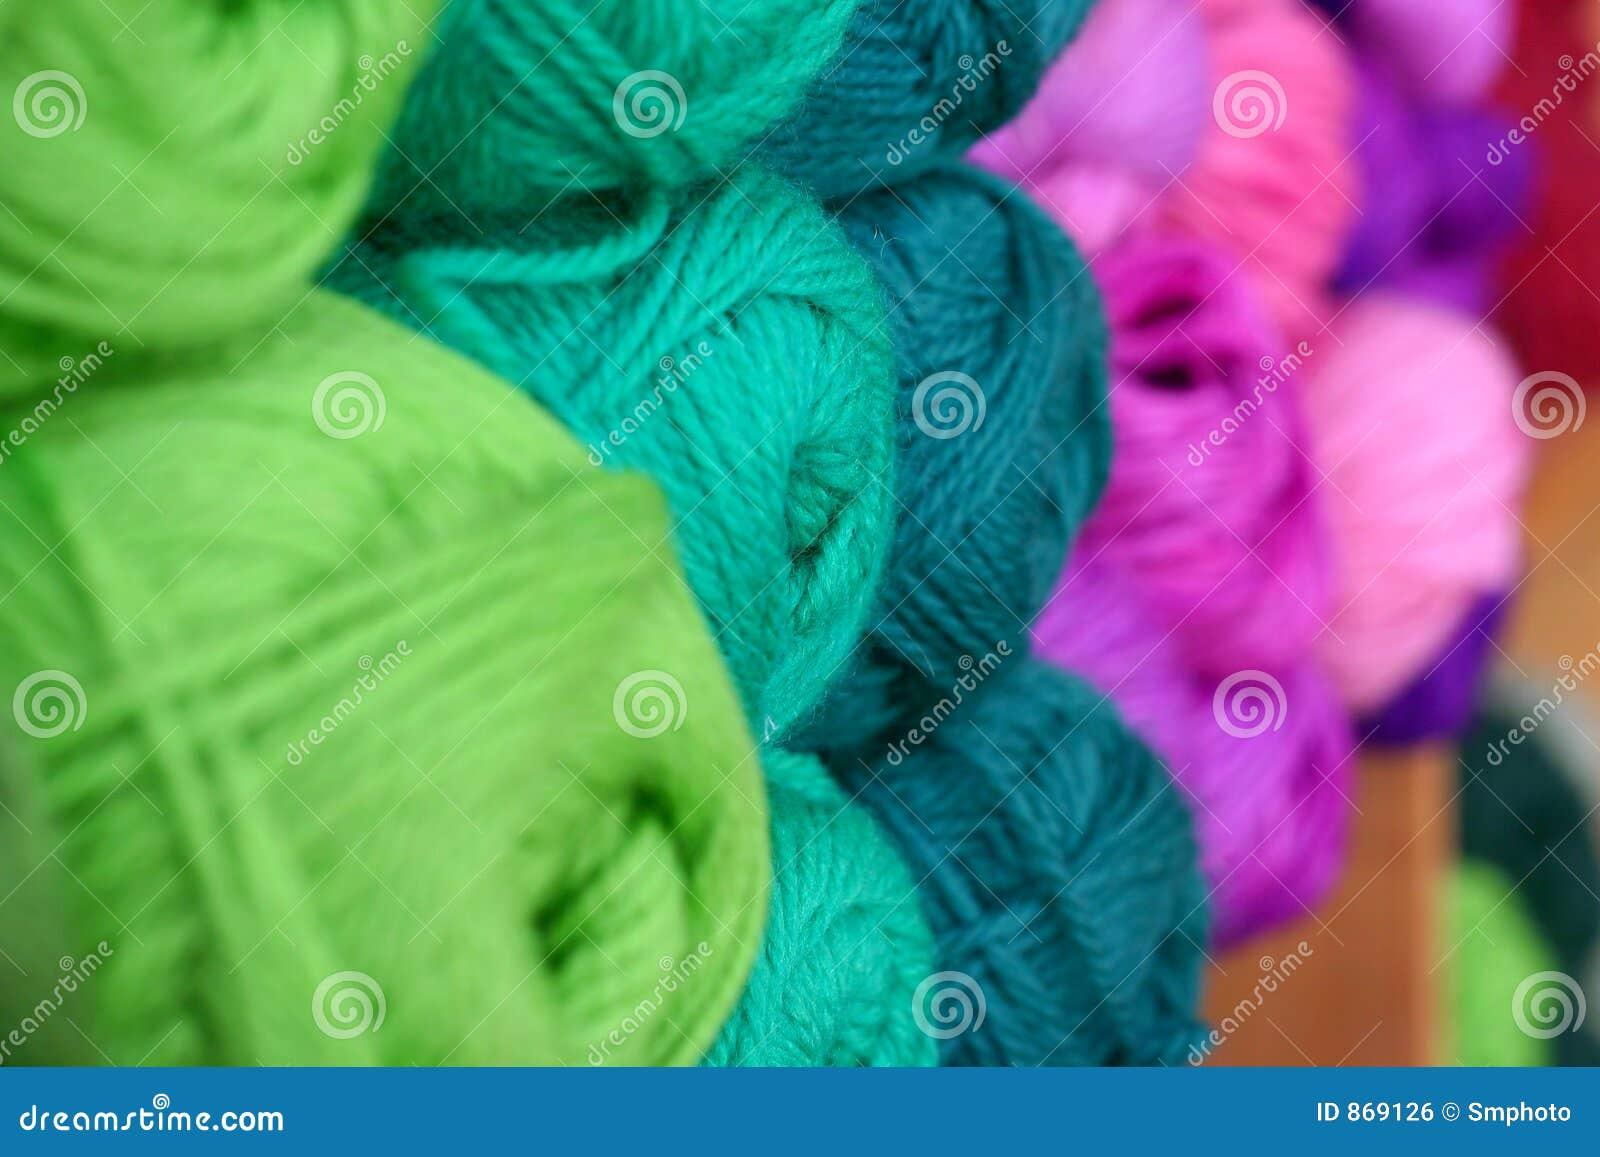 Rows of yarn